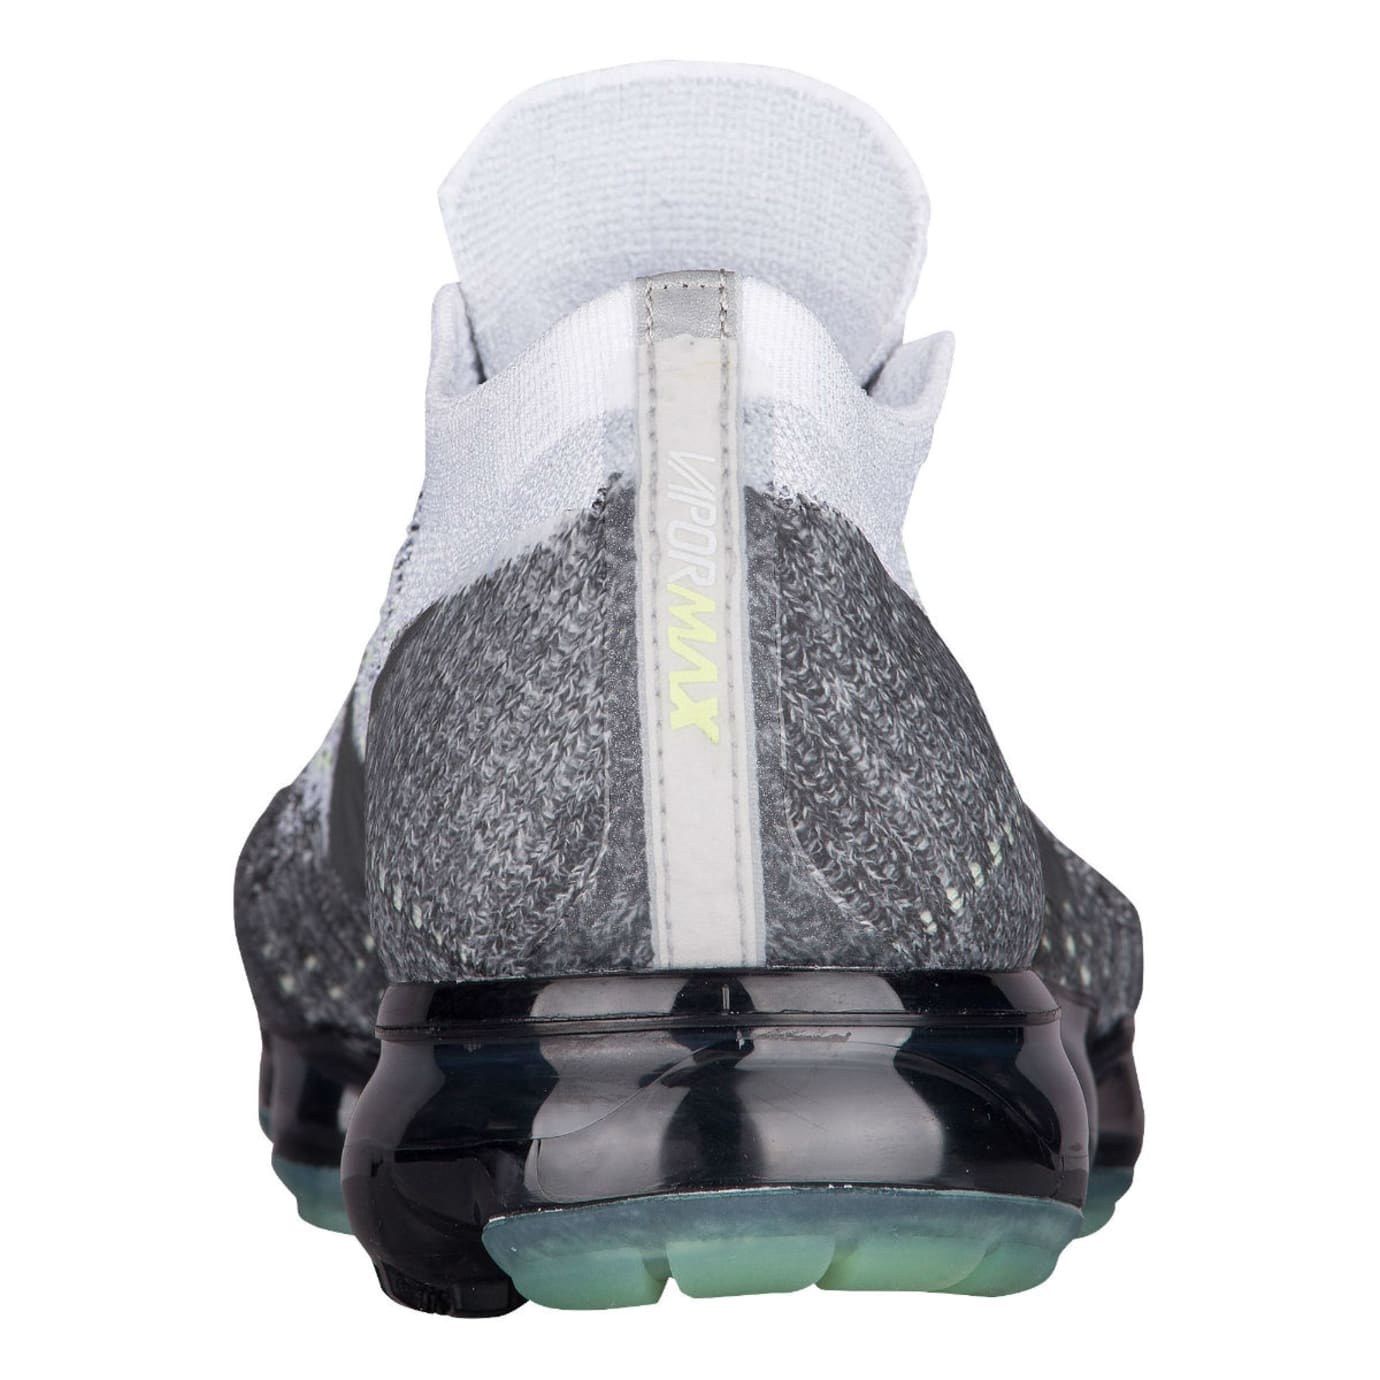 Nike Air VaporMax Flyknit Heritage Pack Pure Platinum White Dark Grey Release Date 922915-002 Heel